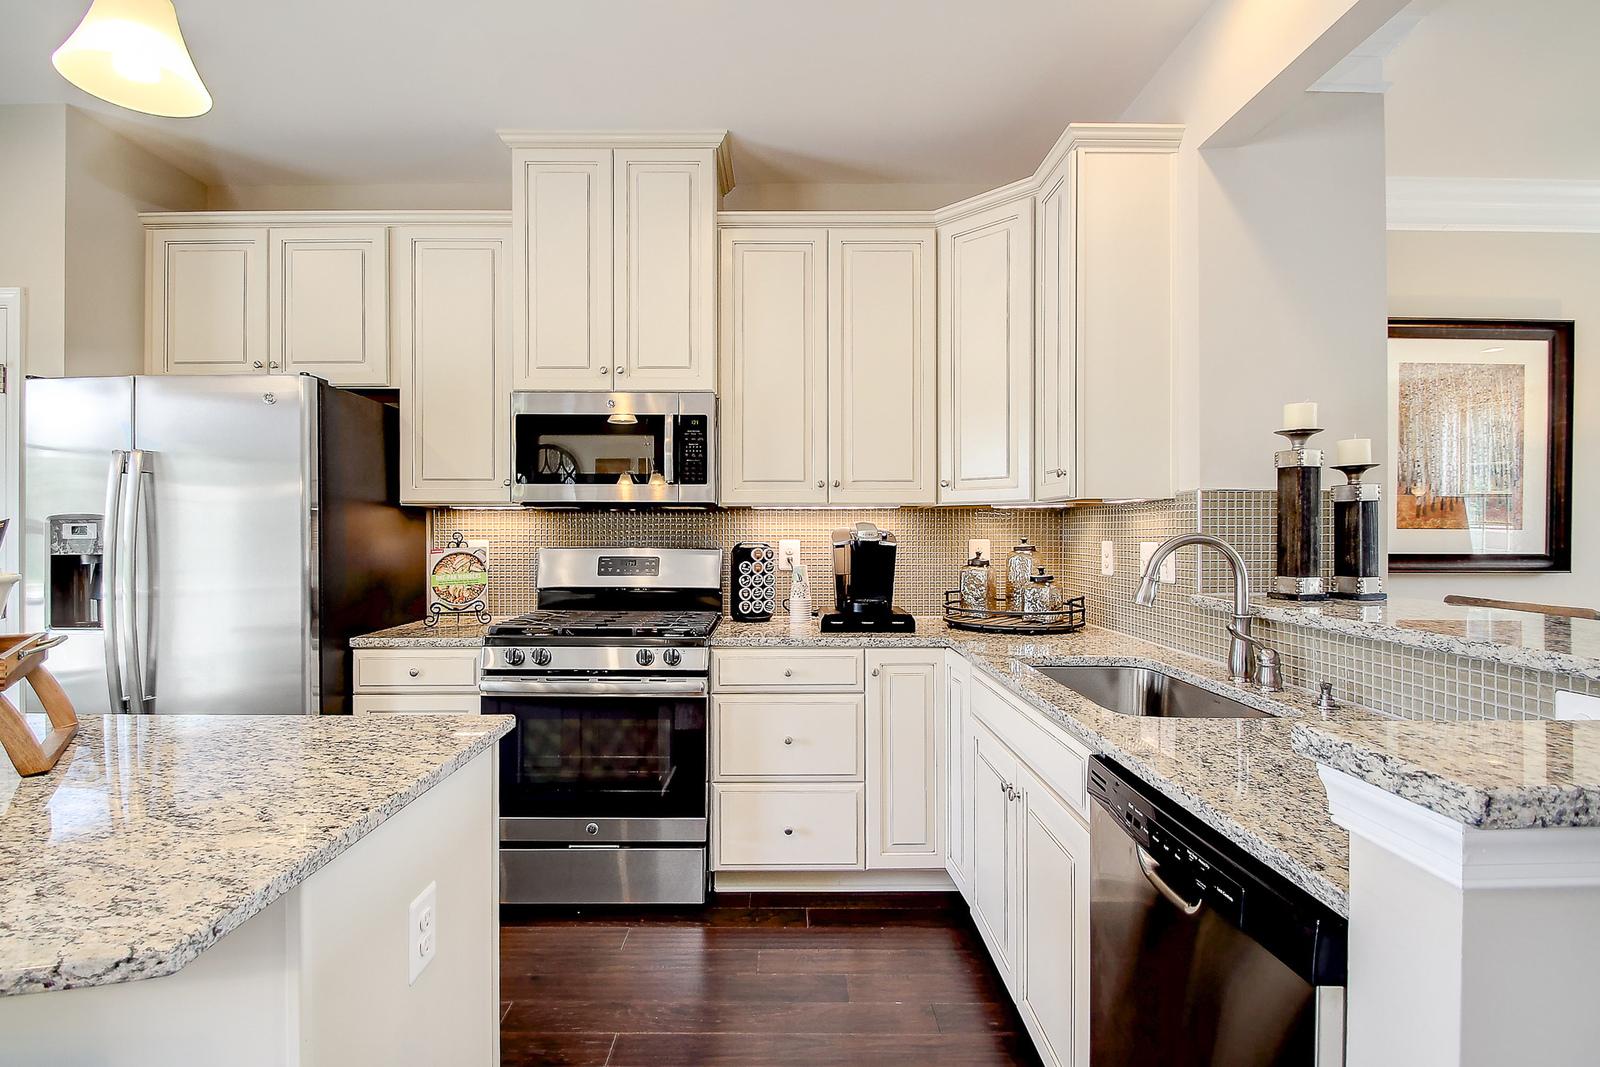 New Homes for sale at The Villages At Cross Keys in Sicklerville, NJ ...